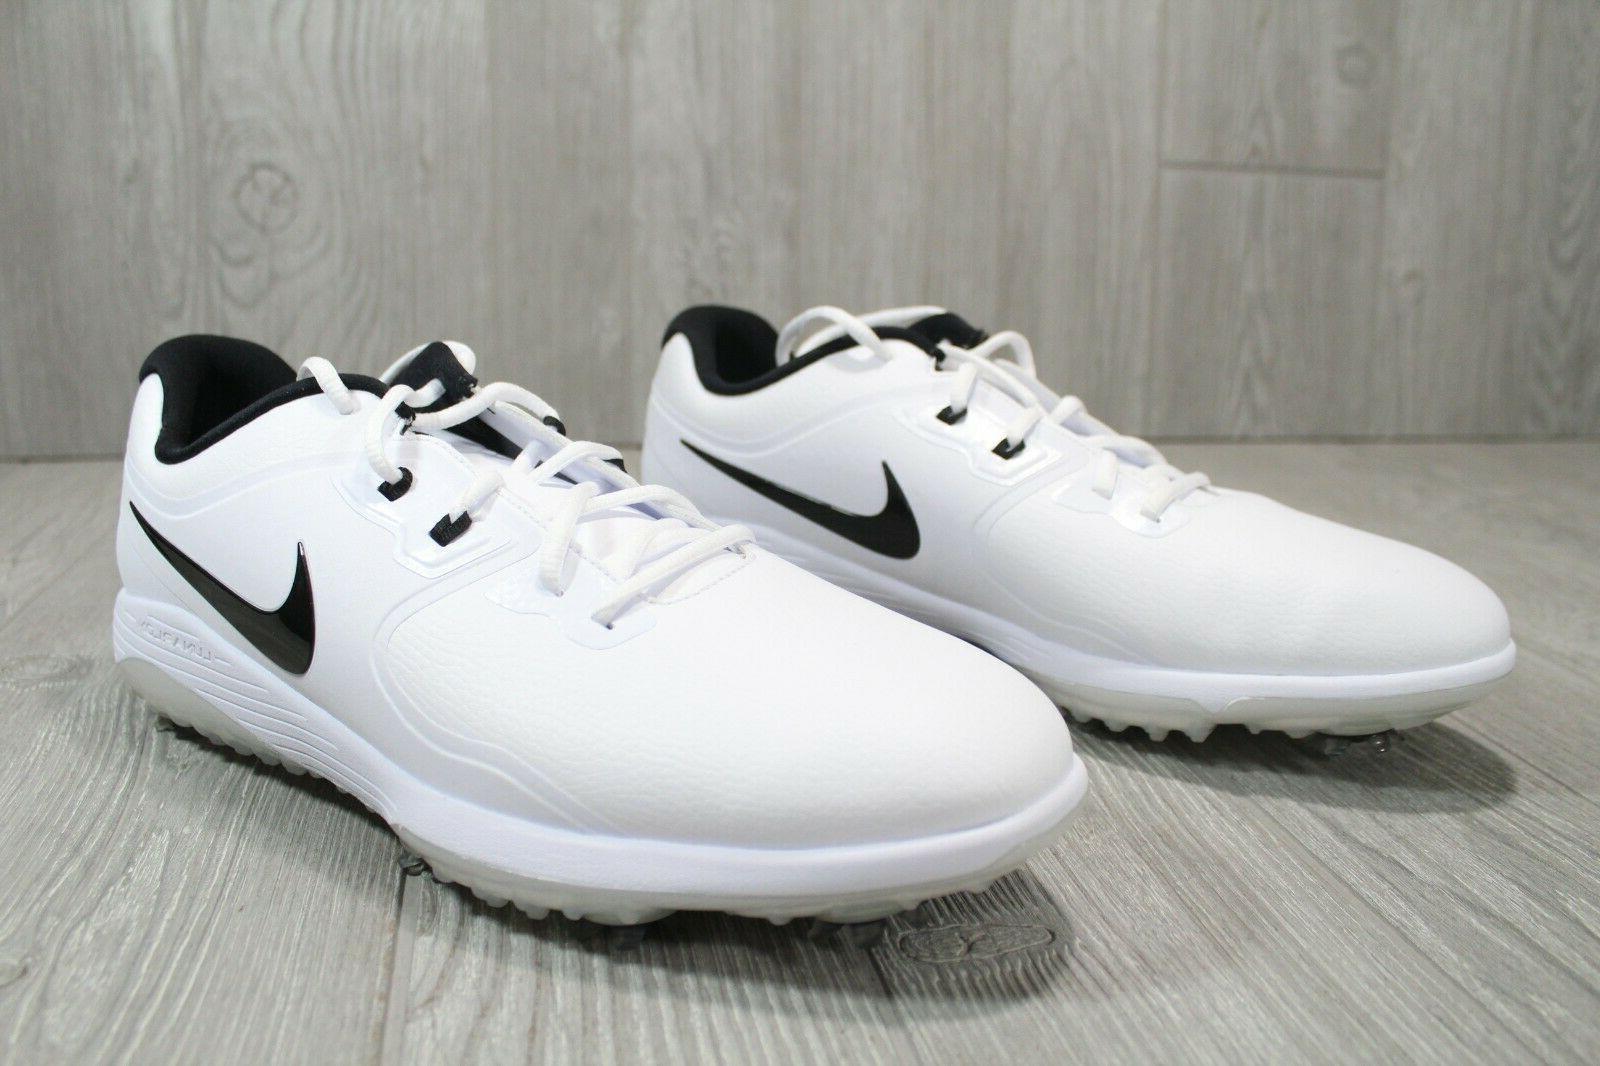 52 Nike Men's AQ2197-101 White Black 8 -